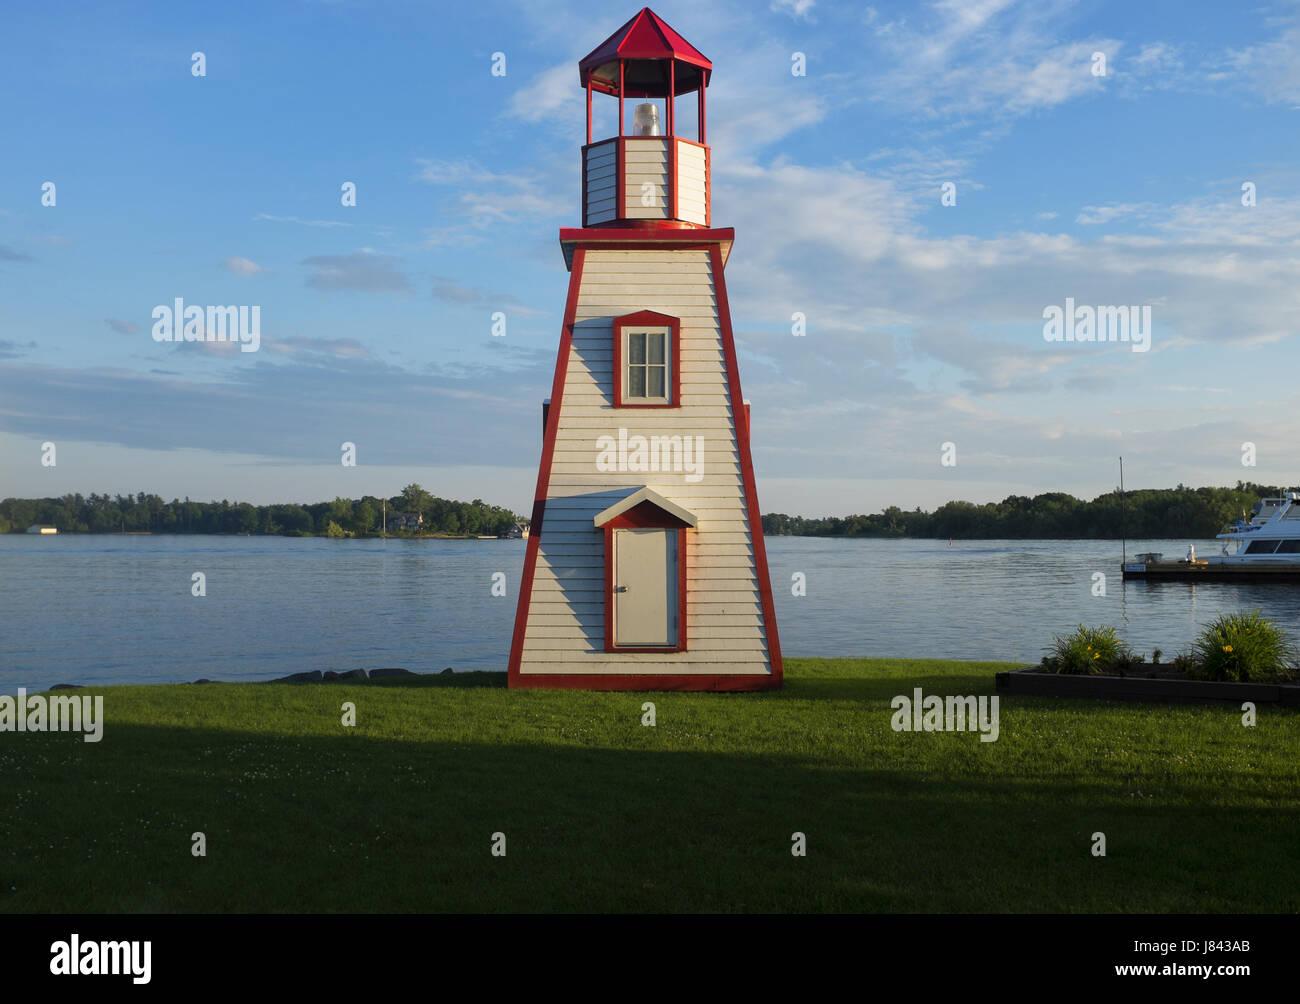 Light house tgp phrase something